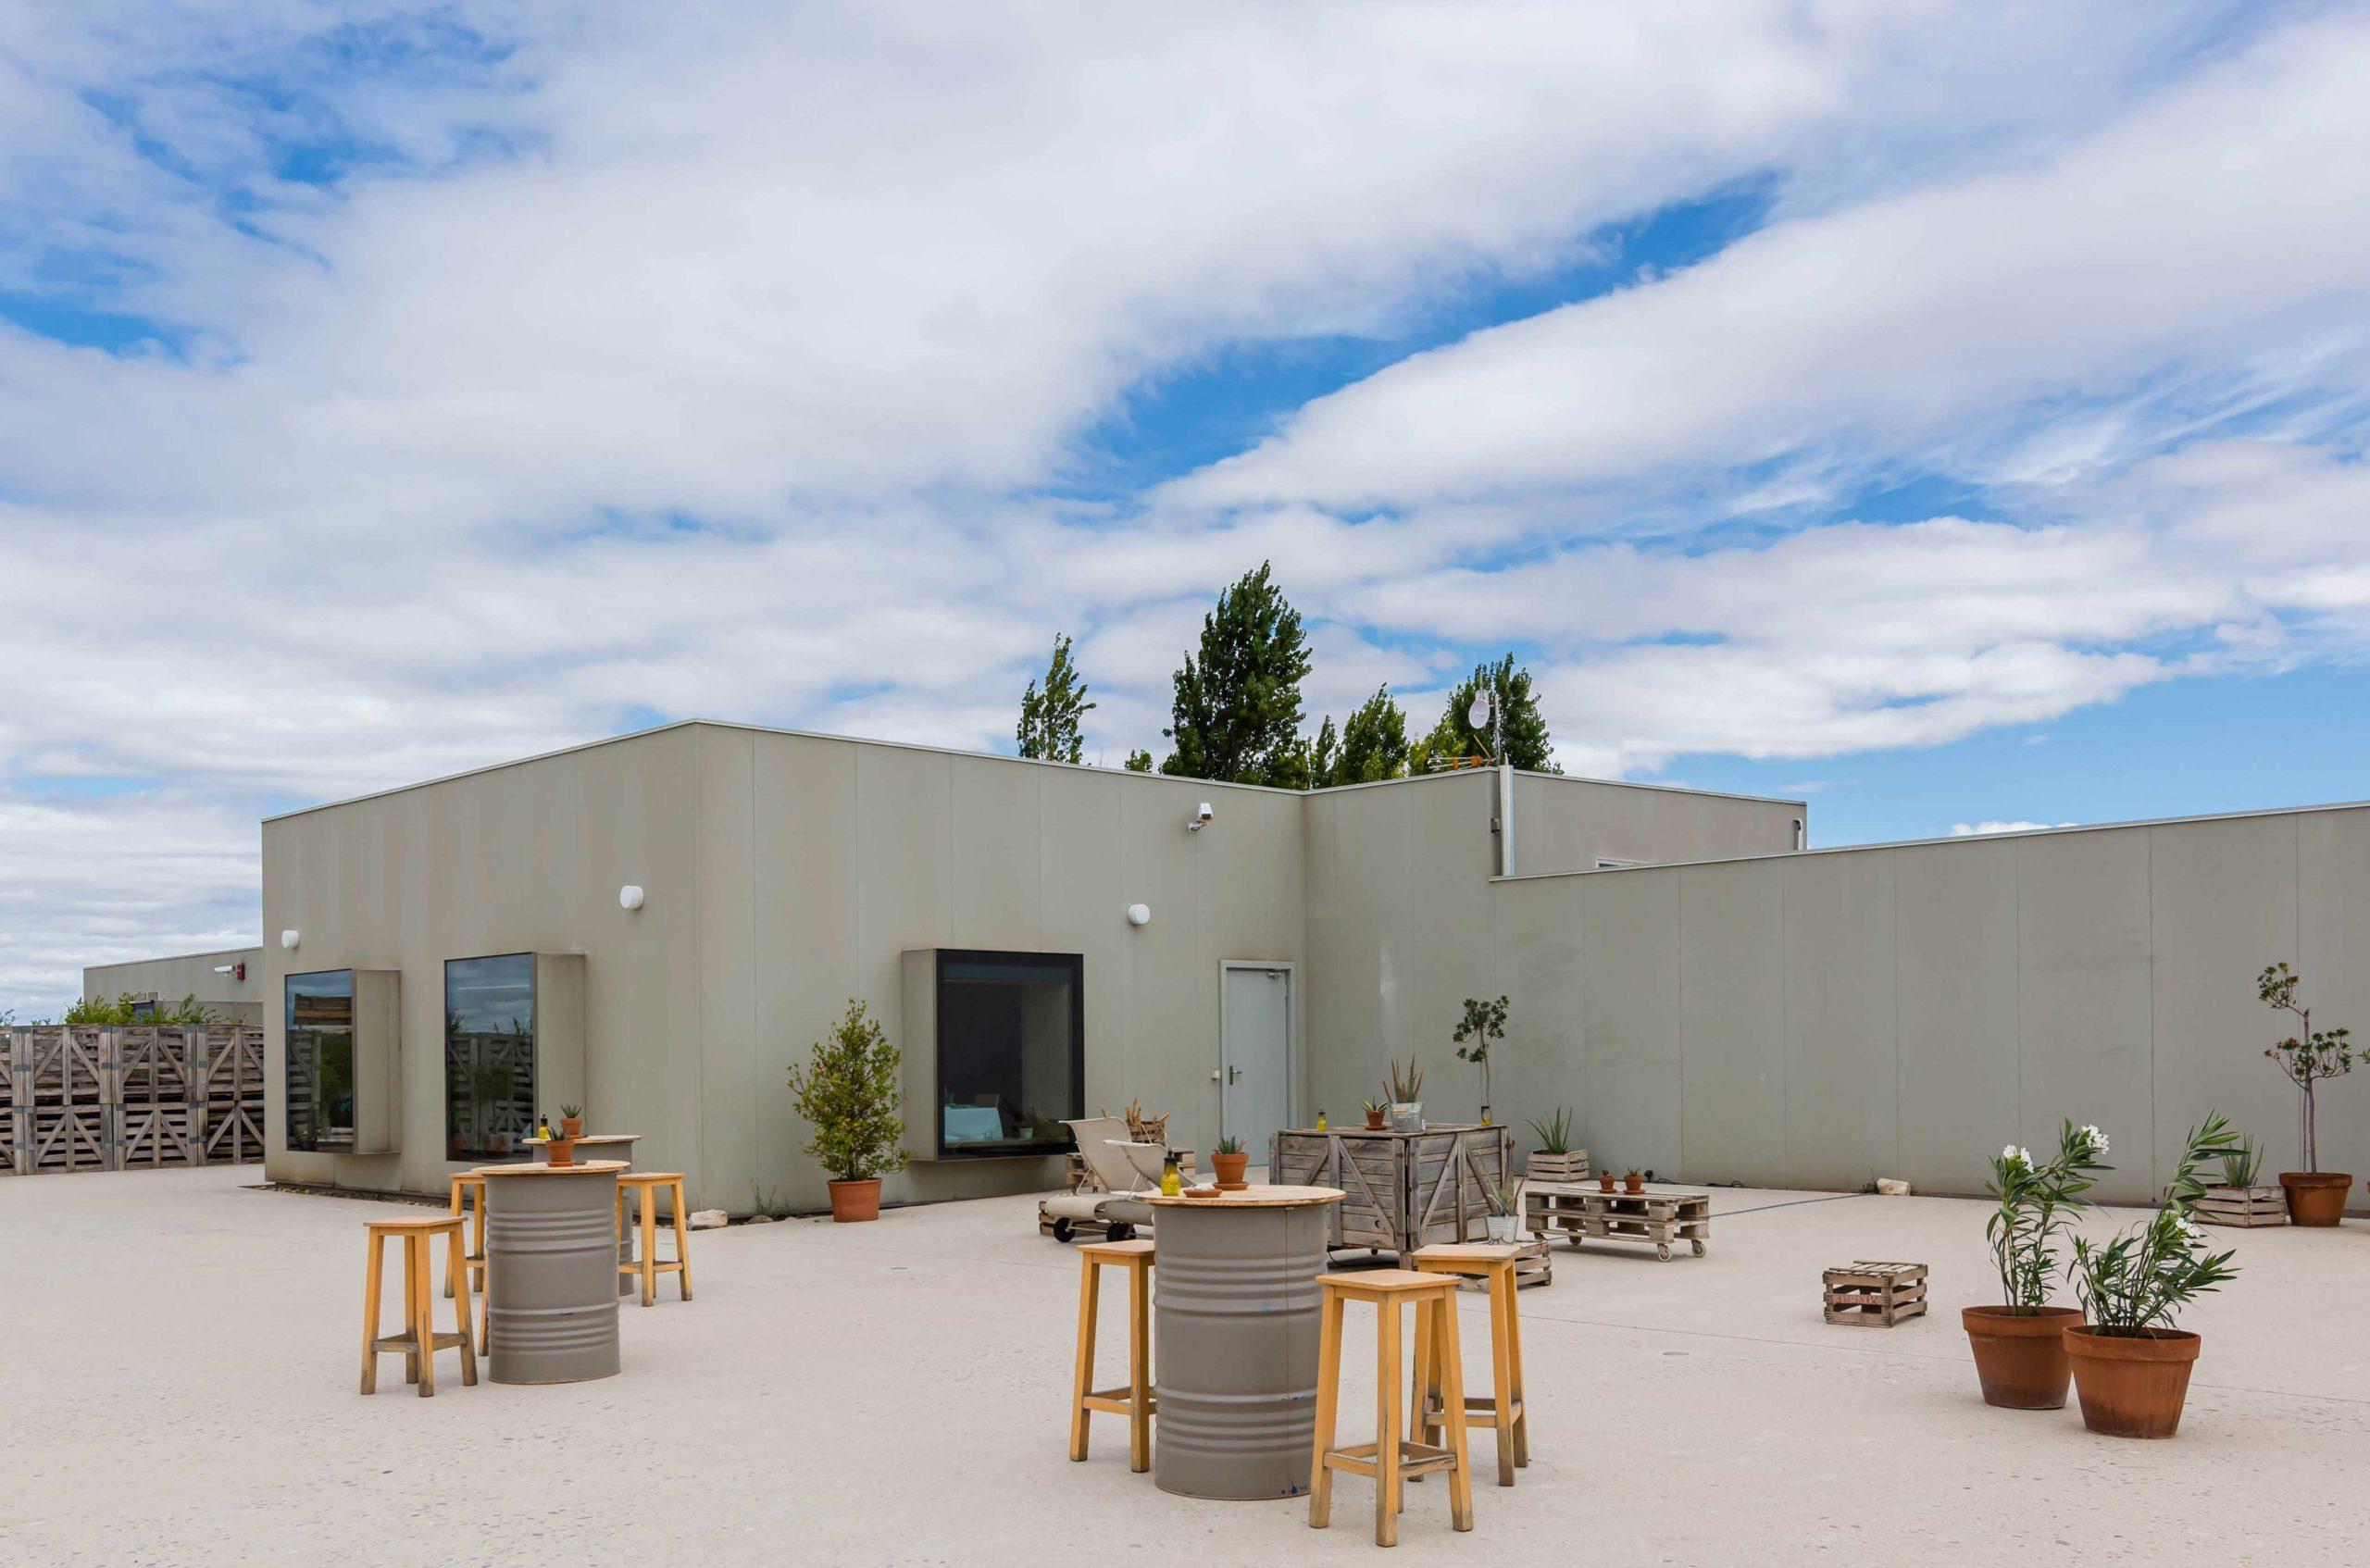 Hotel Aire de Bardenas - Fotografía de arquitectura e interiorismo